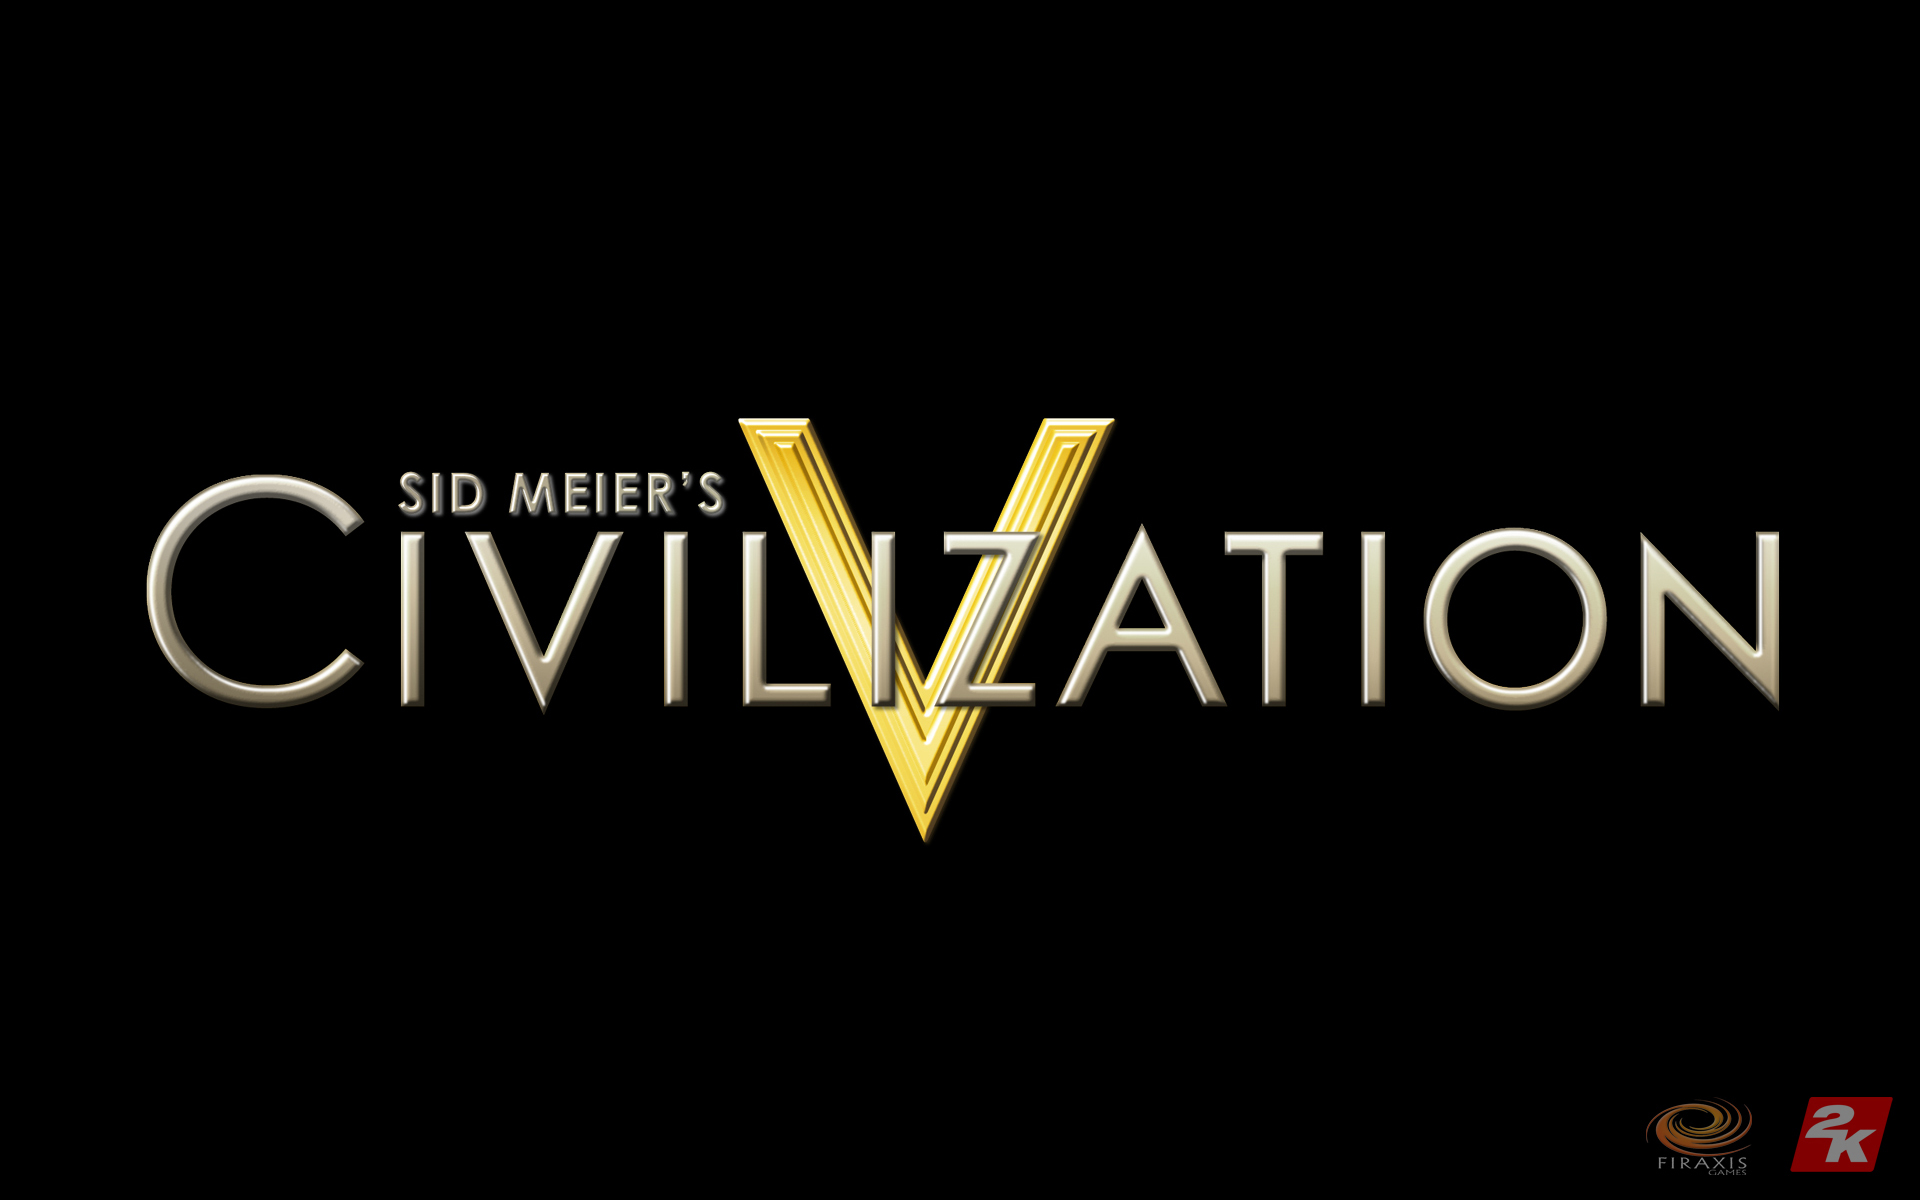 Скачать русификатор текста для Sid Meier's Civilization V.